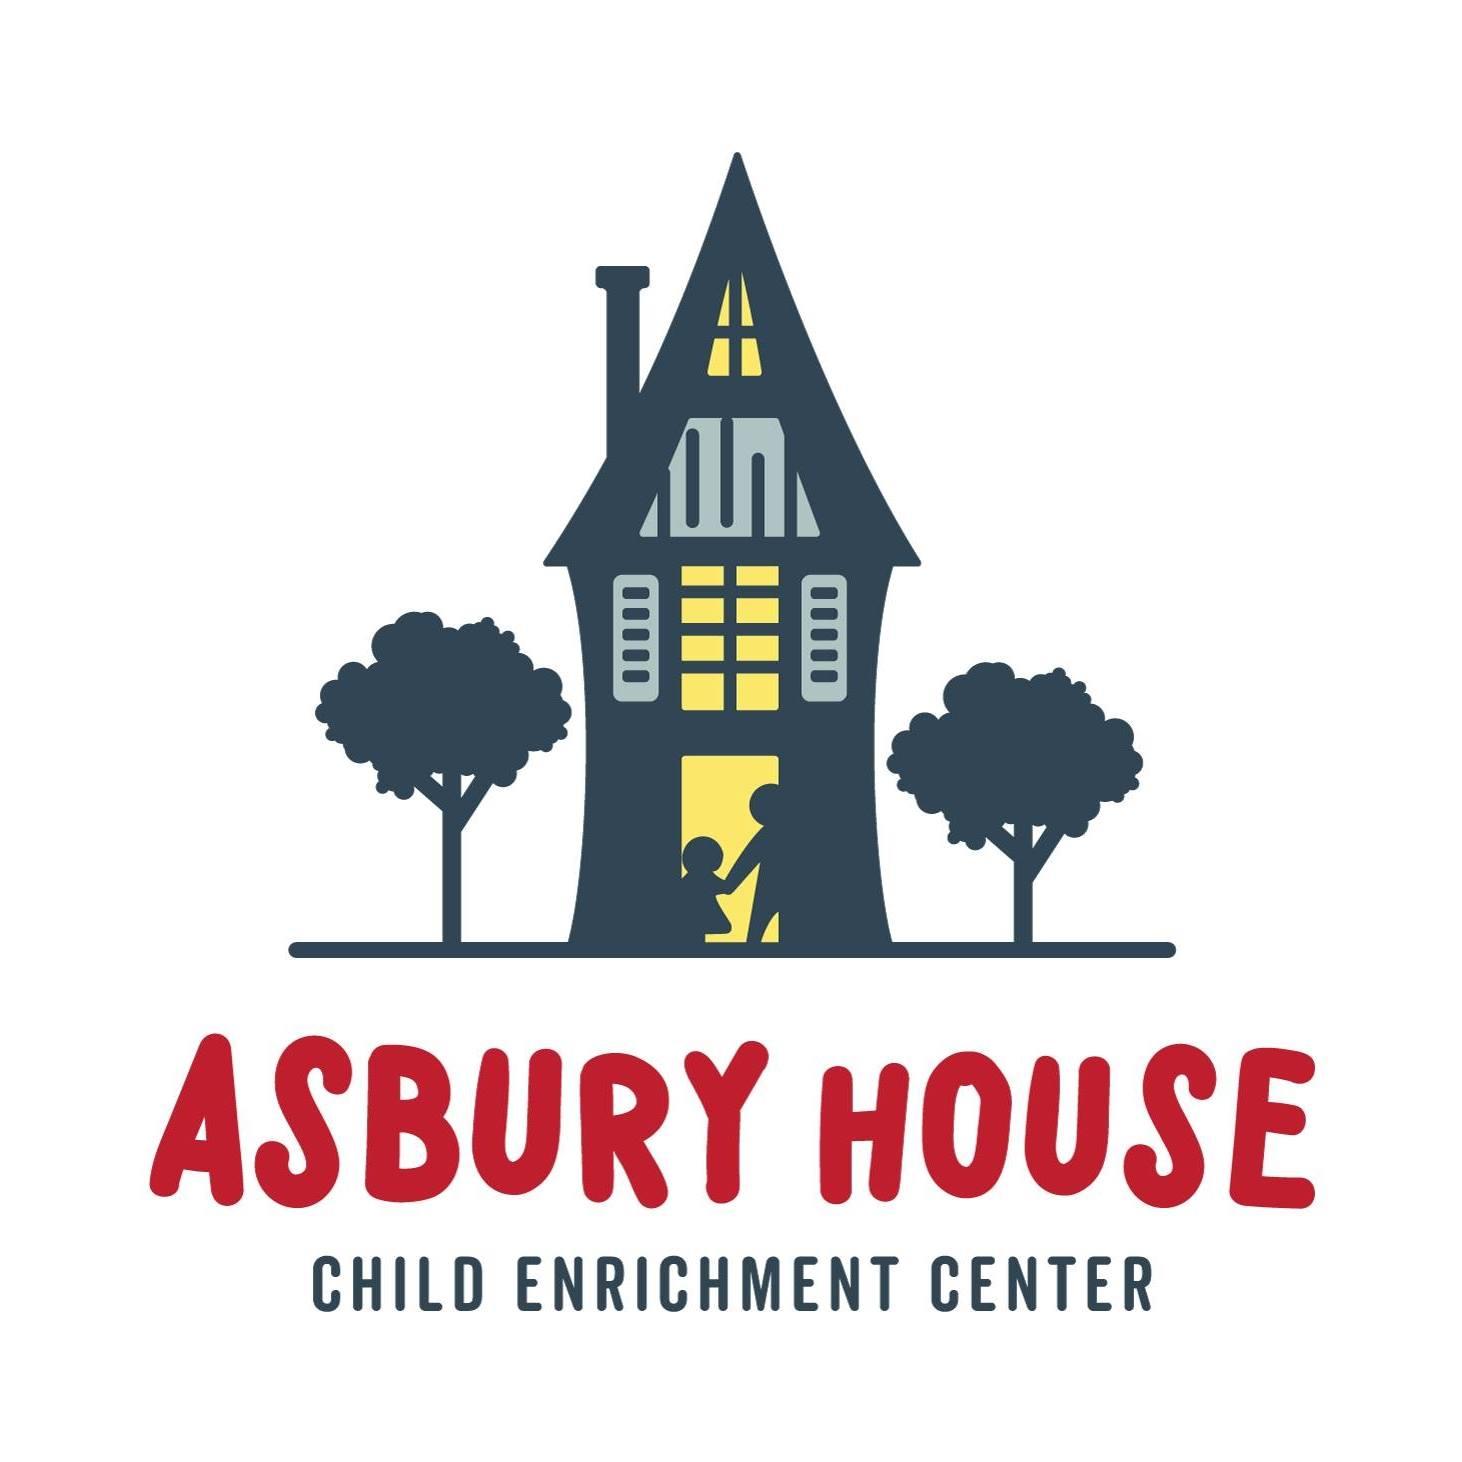 Asbury House - 320 S Center St.Longview, TX 75601903-758-7062info@asburyhouse.net